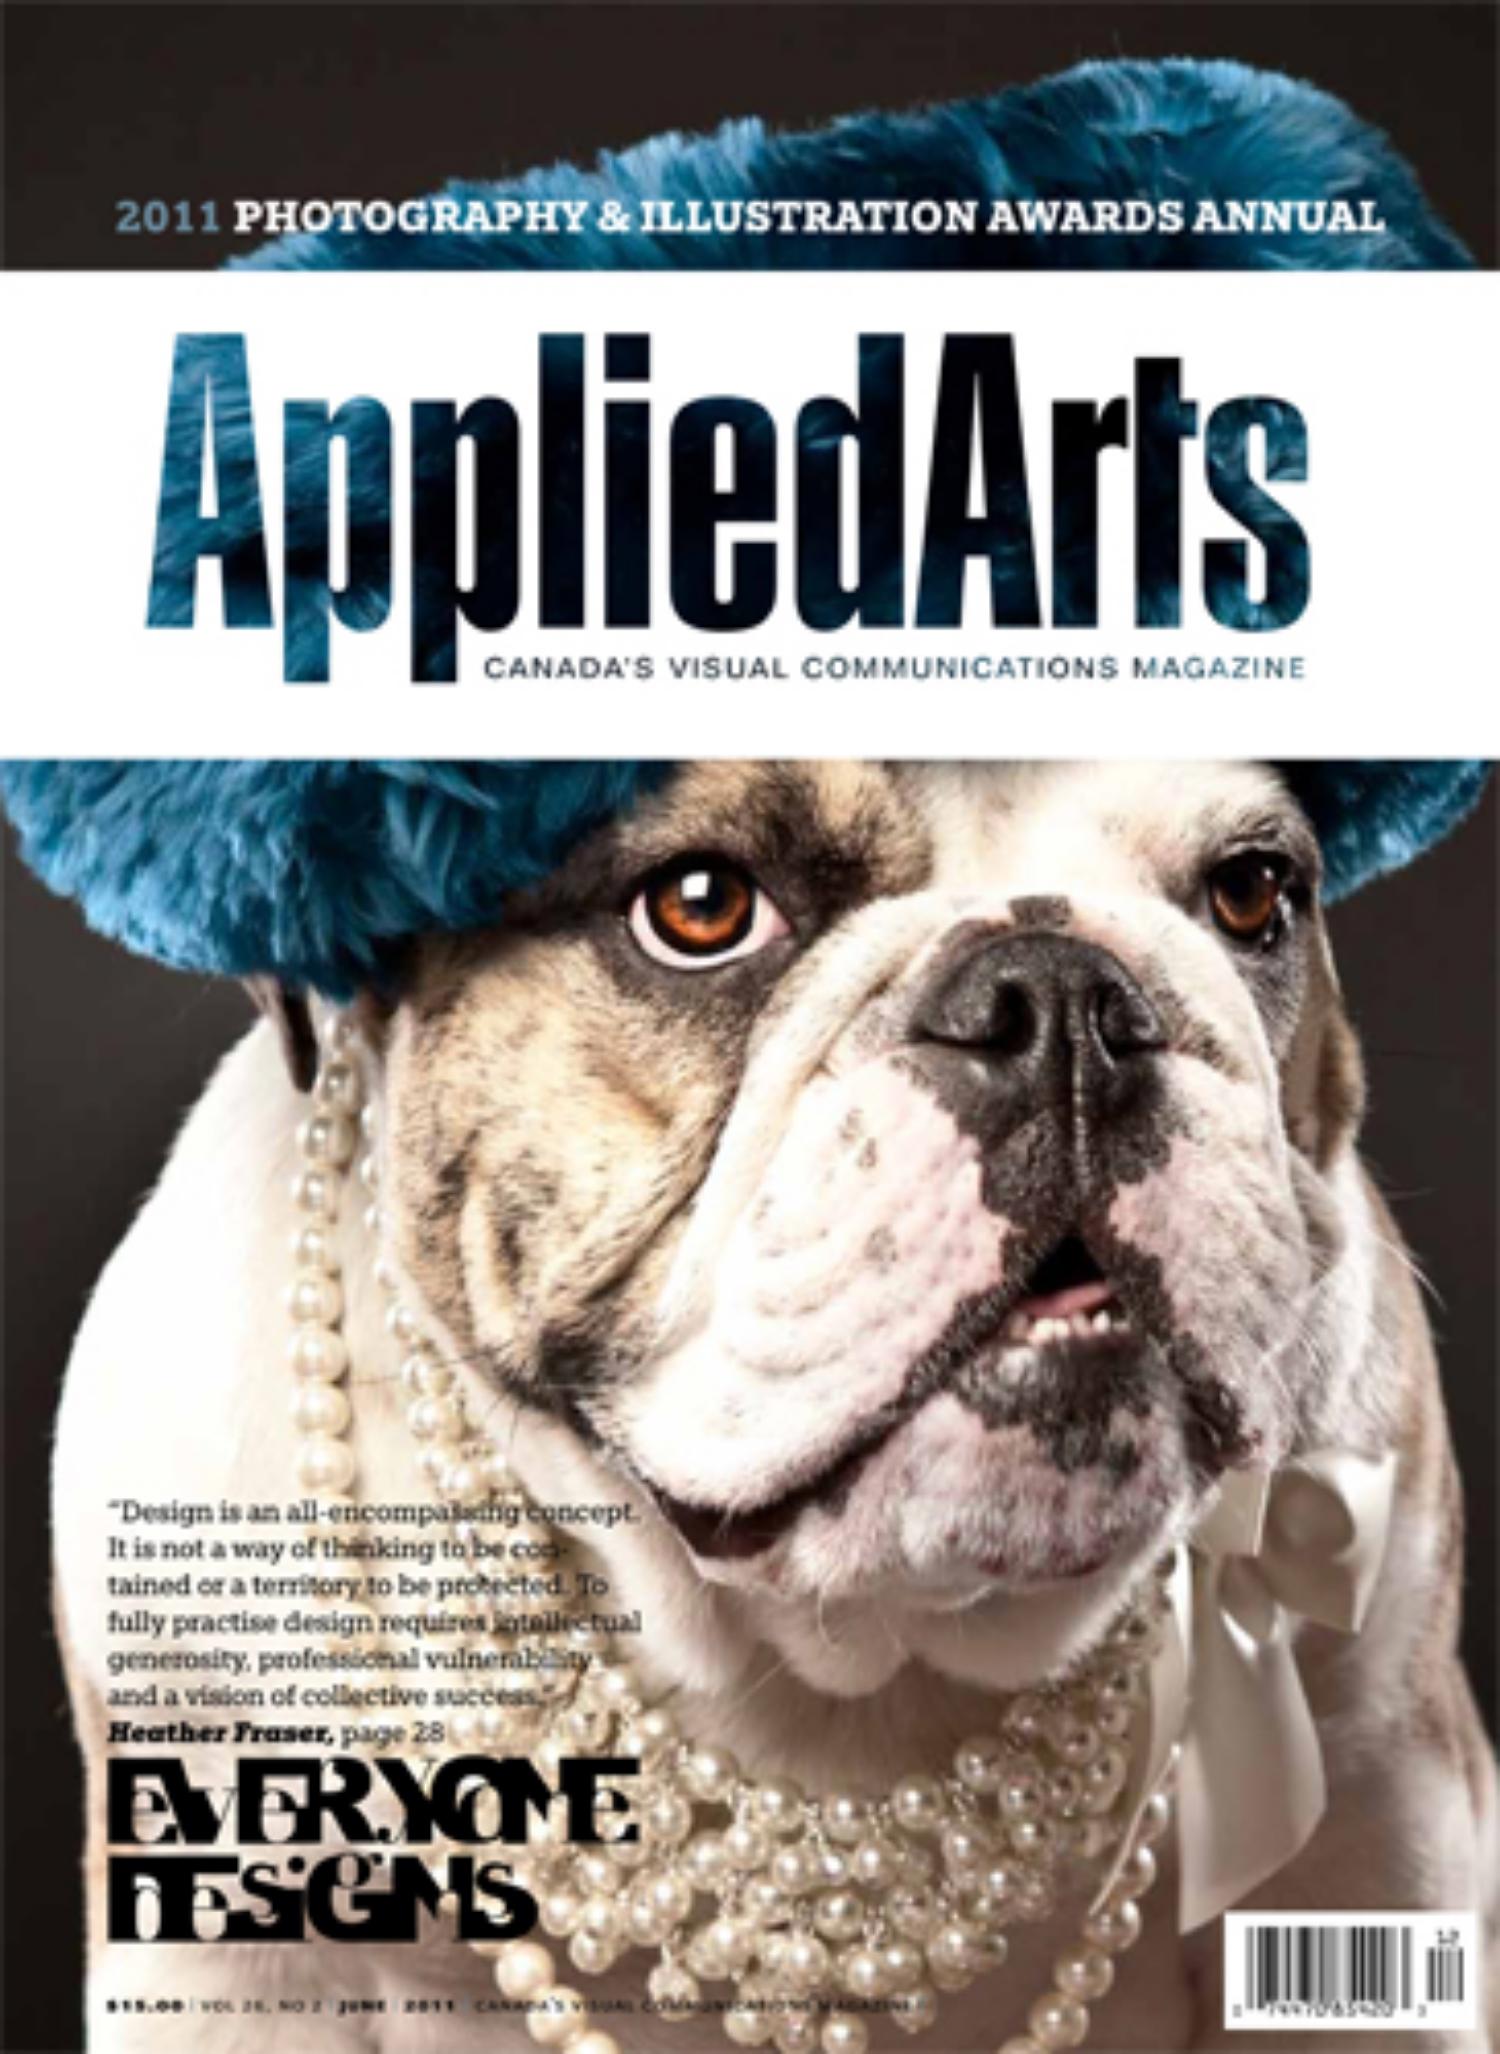 Applied Arts Photography & Illustration Awards